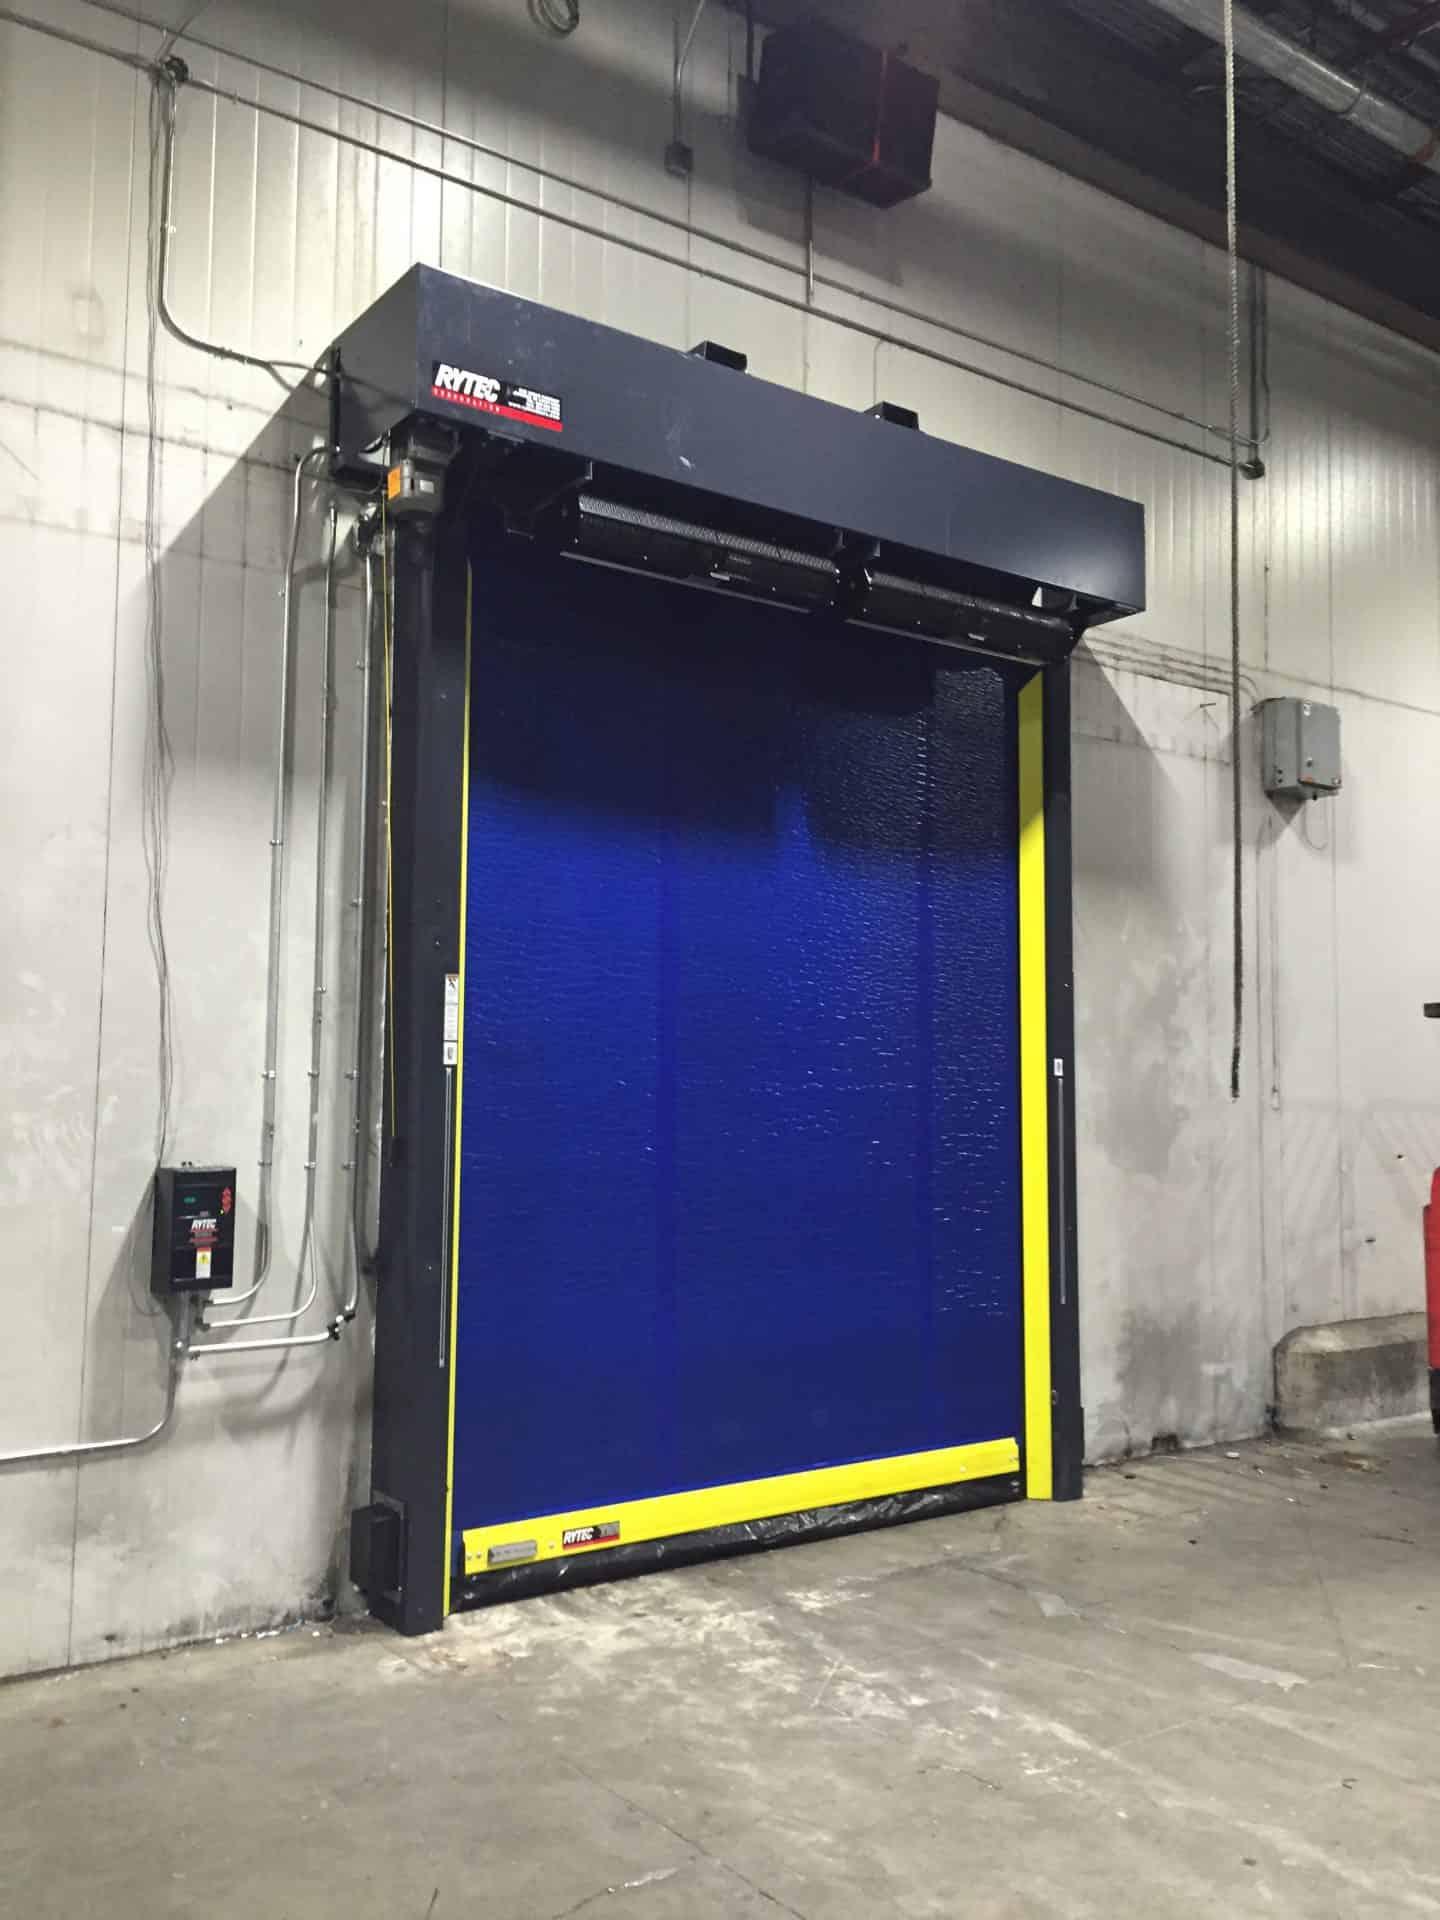 Cold storage facility freezer door